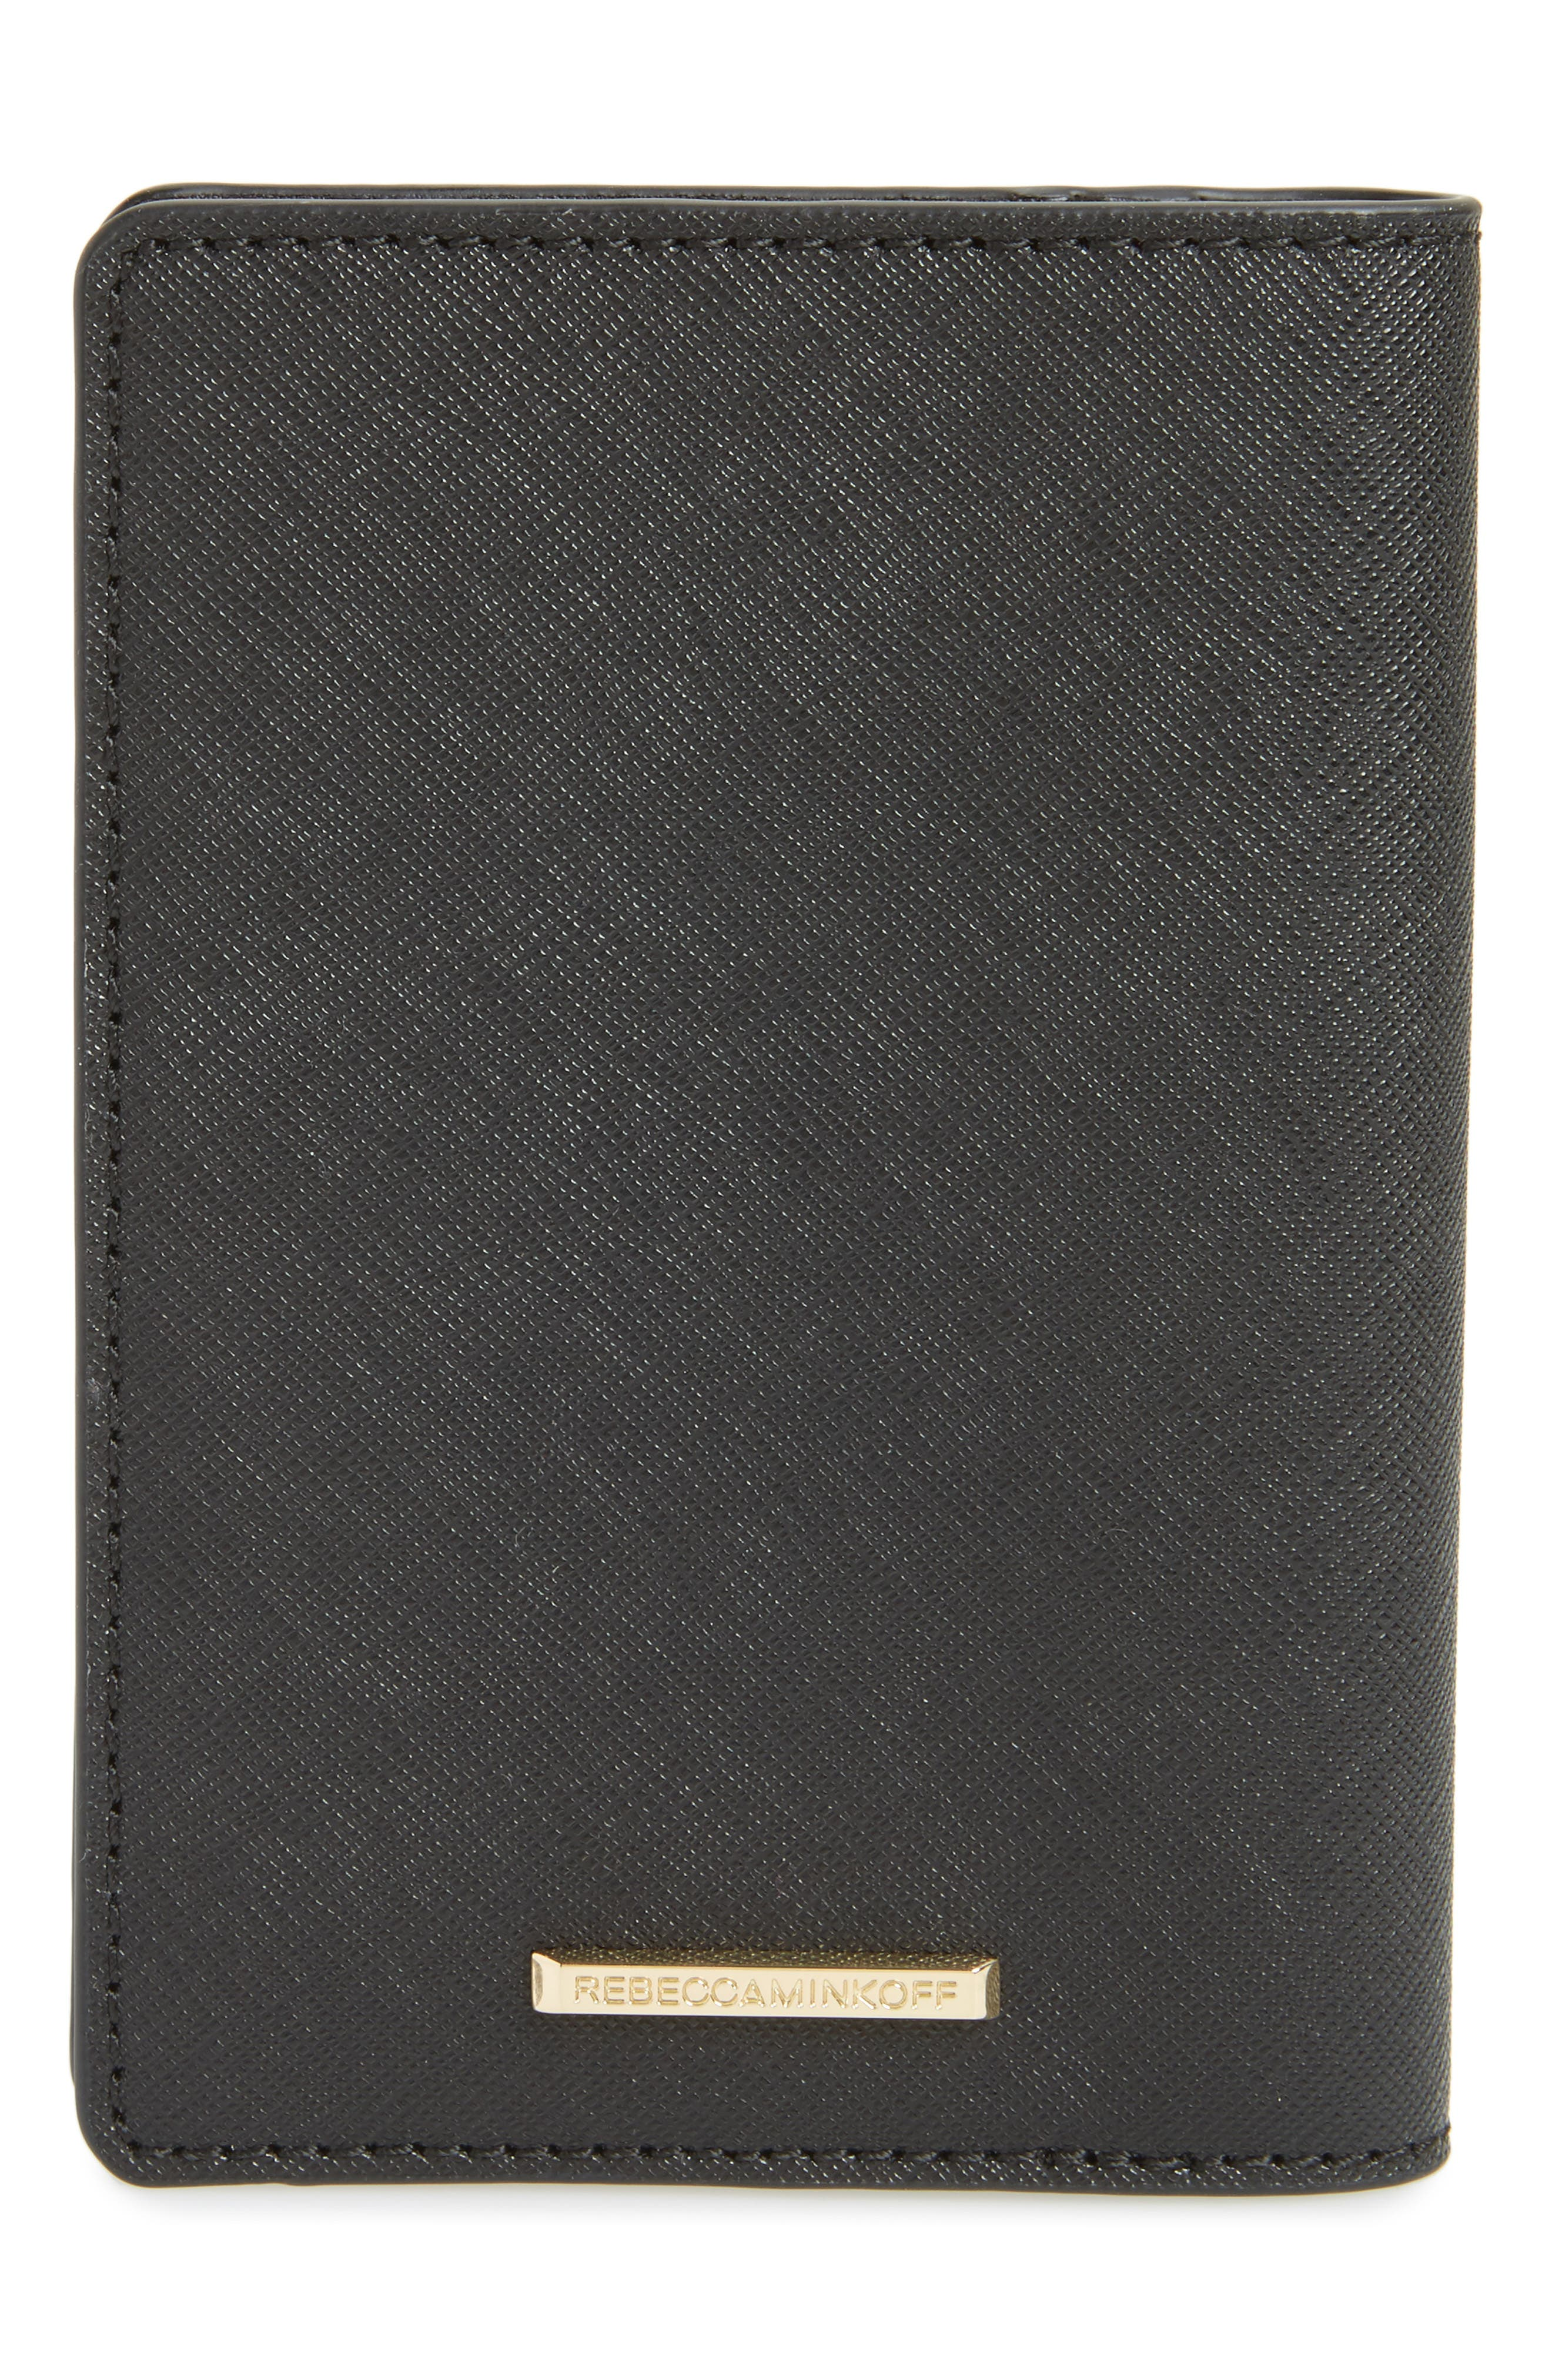 Leather Passport Holder,                             Alternate thumbnail 4, color,                             Black